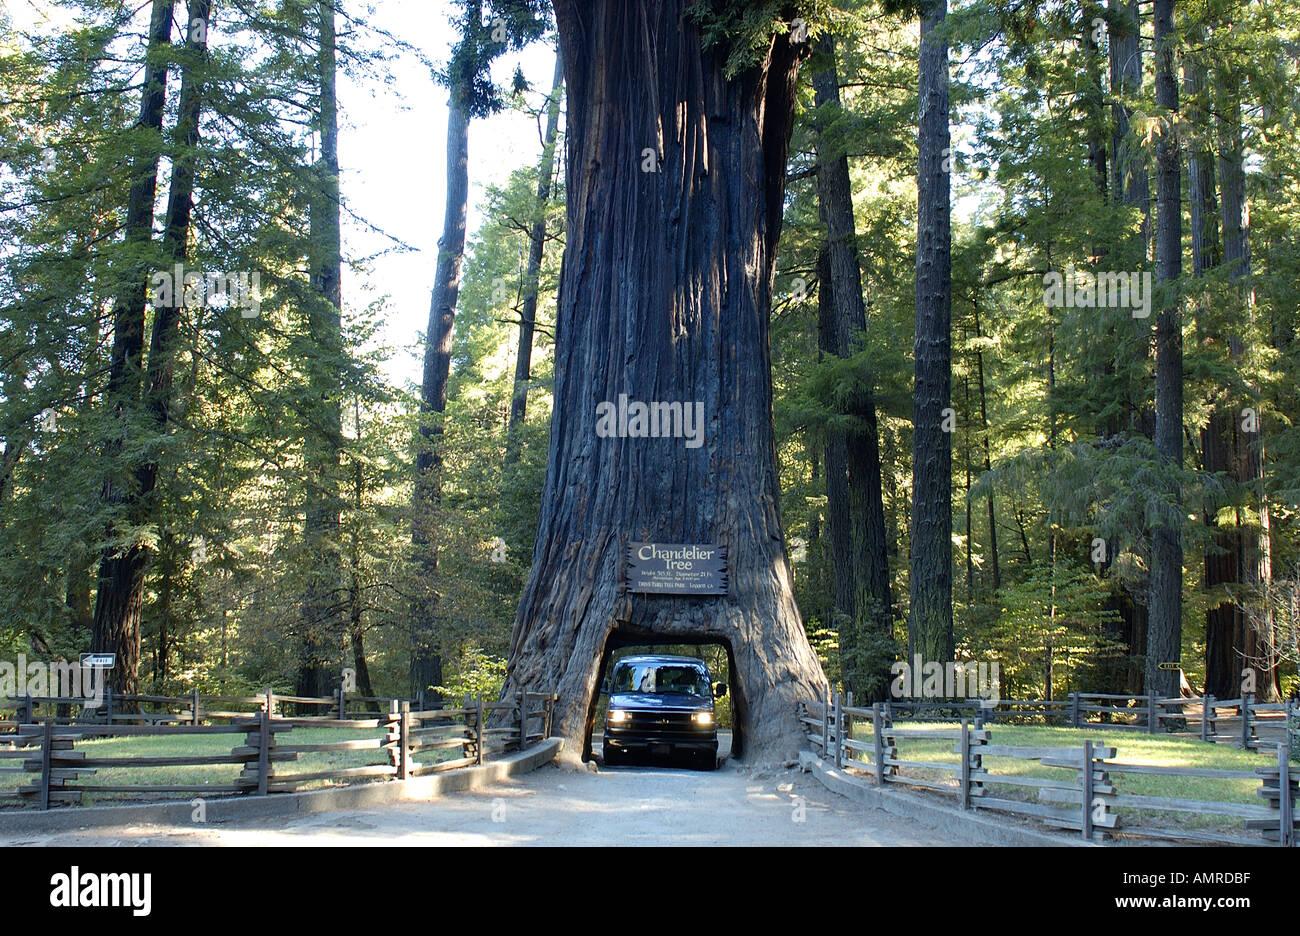 Chandelier Tree Leggett Valley California USA Stock Photo, Royalty ...